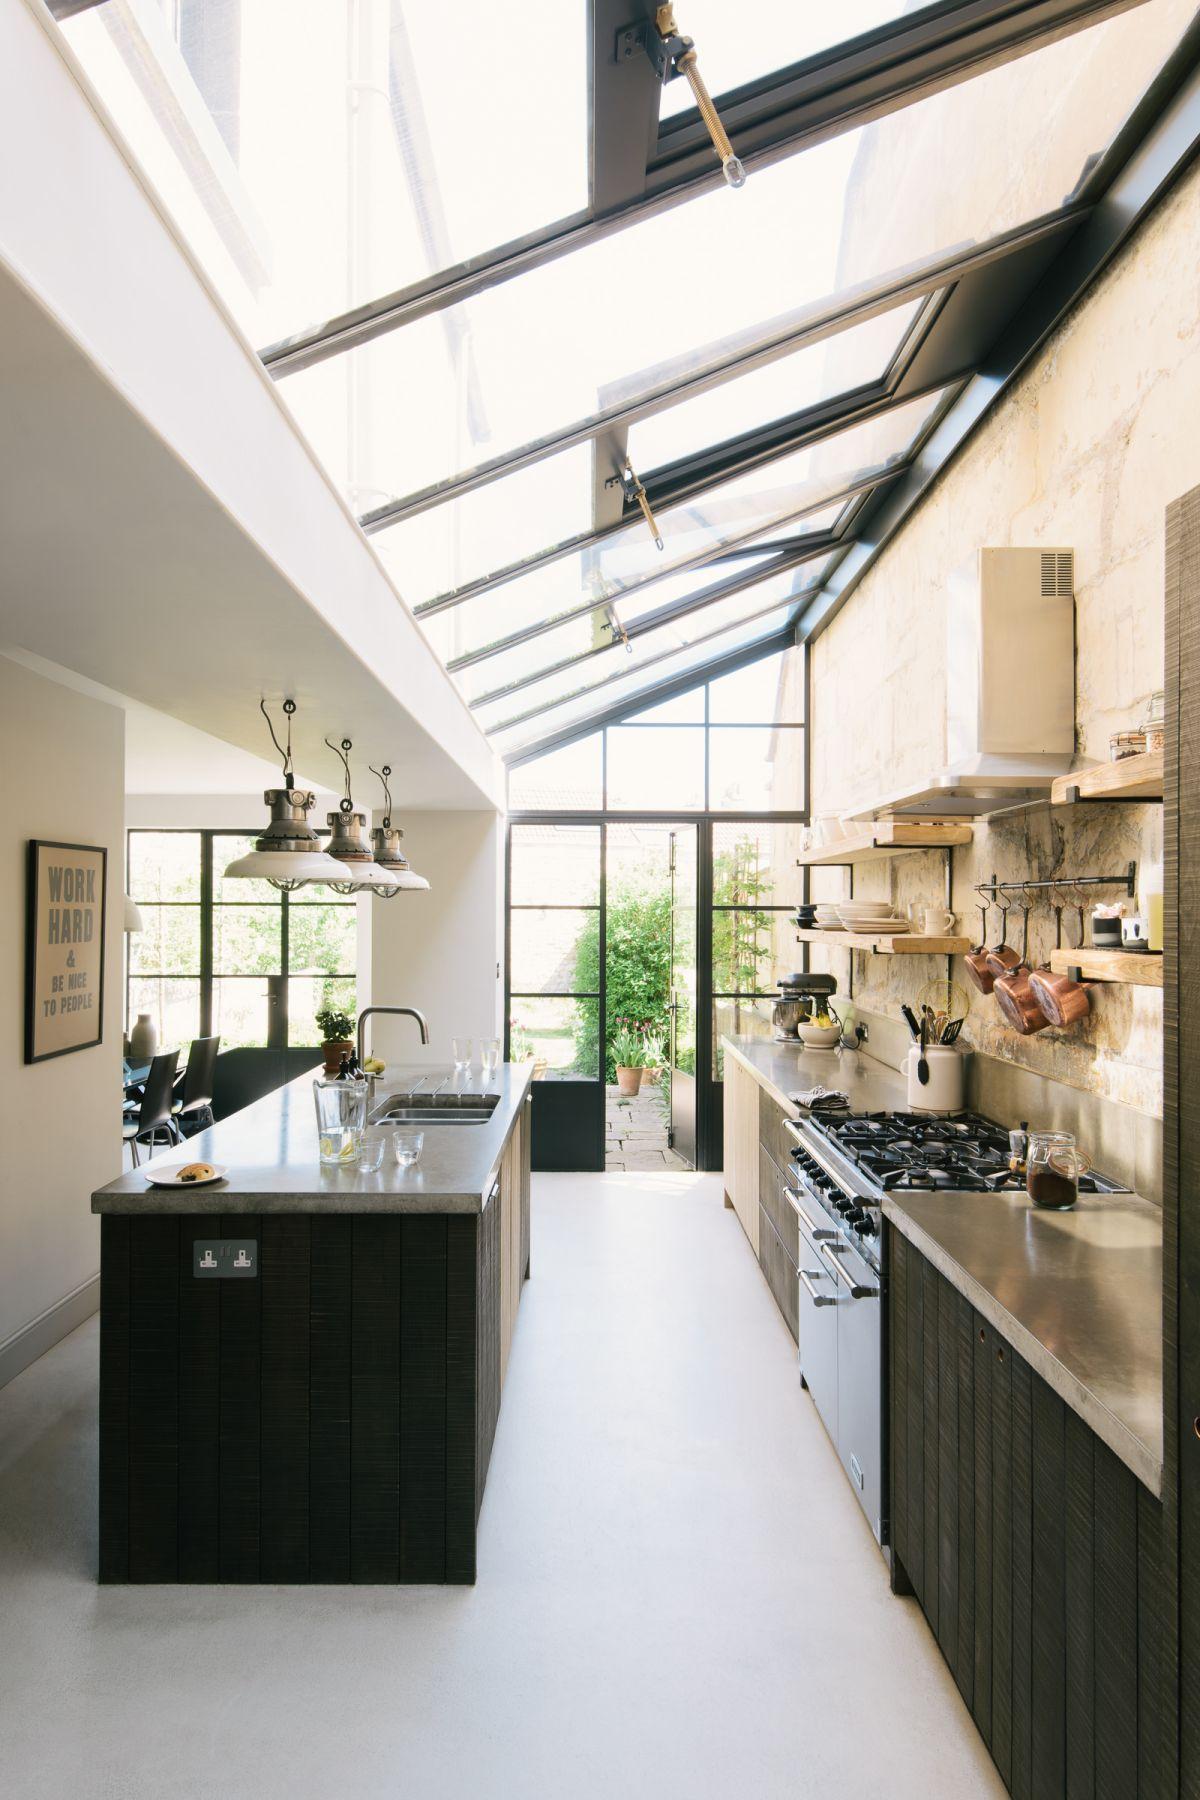 39 Kitchen Ideas Stunning Pictures